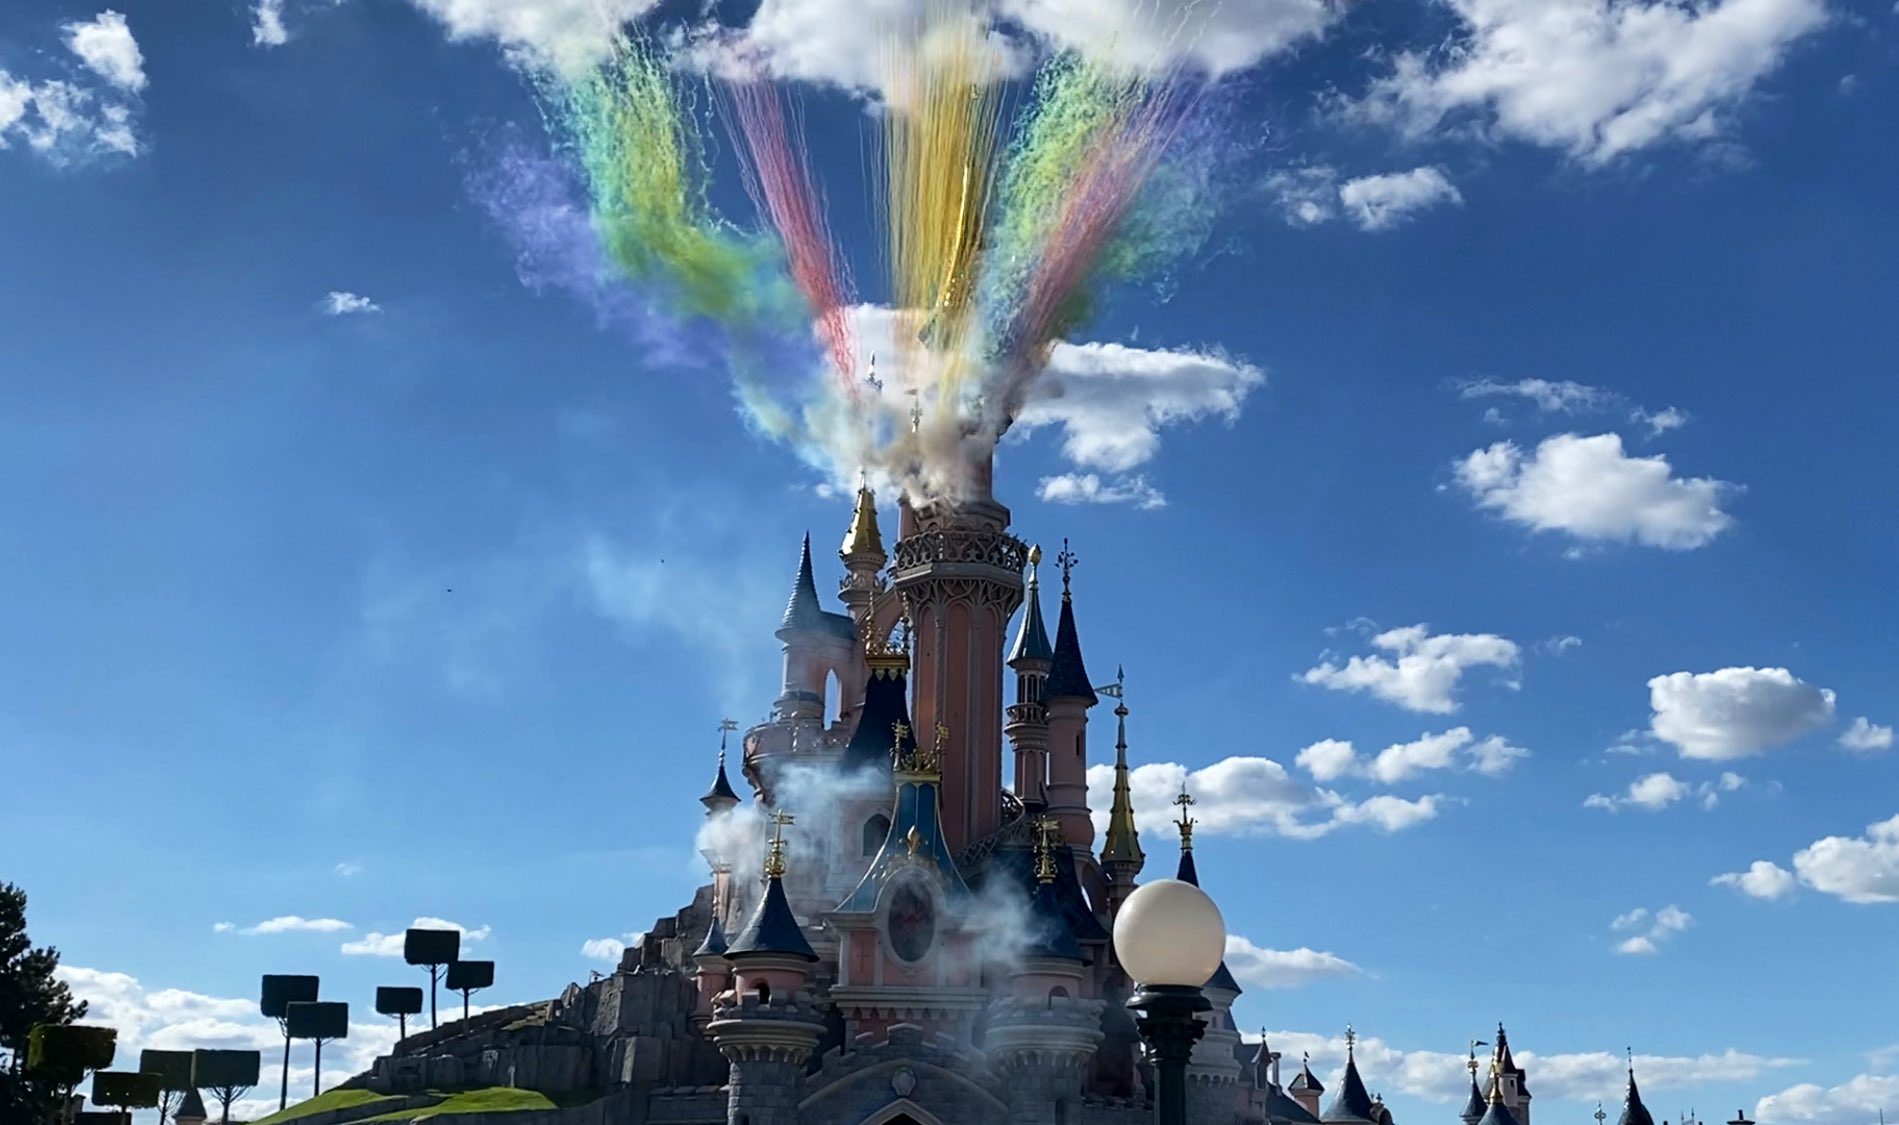 Disneyland Paris ouvert pendant la COVID-19 (juillet-octobre 2020)  - Page 2 Ecqhru4XkAE-yRu?format=jpg&name=large